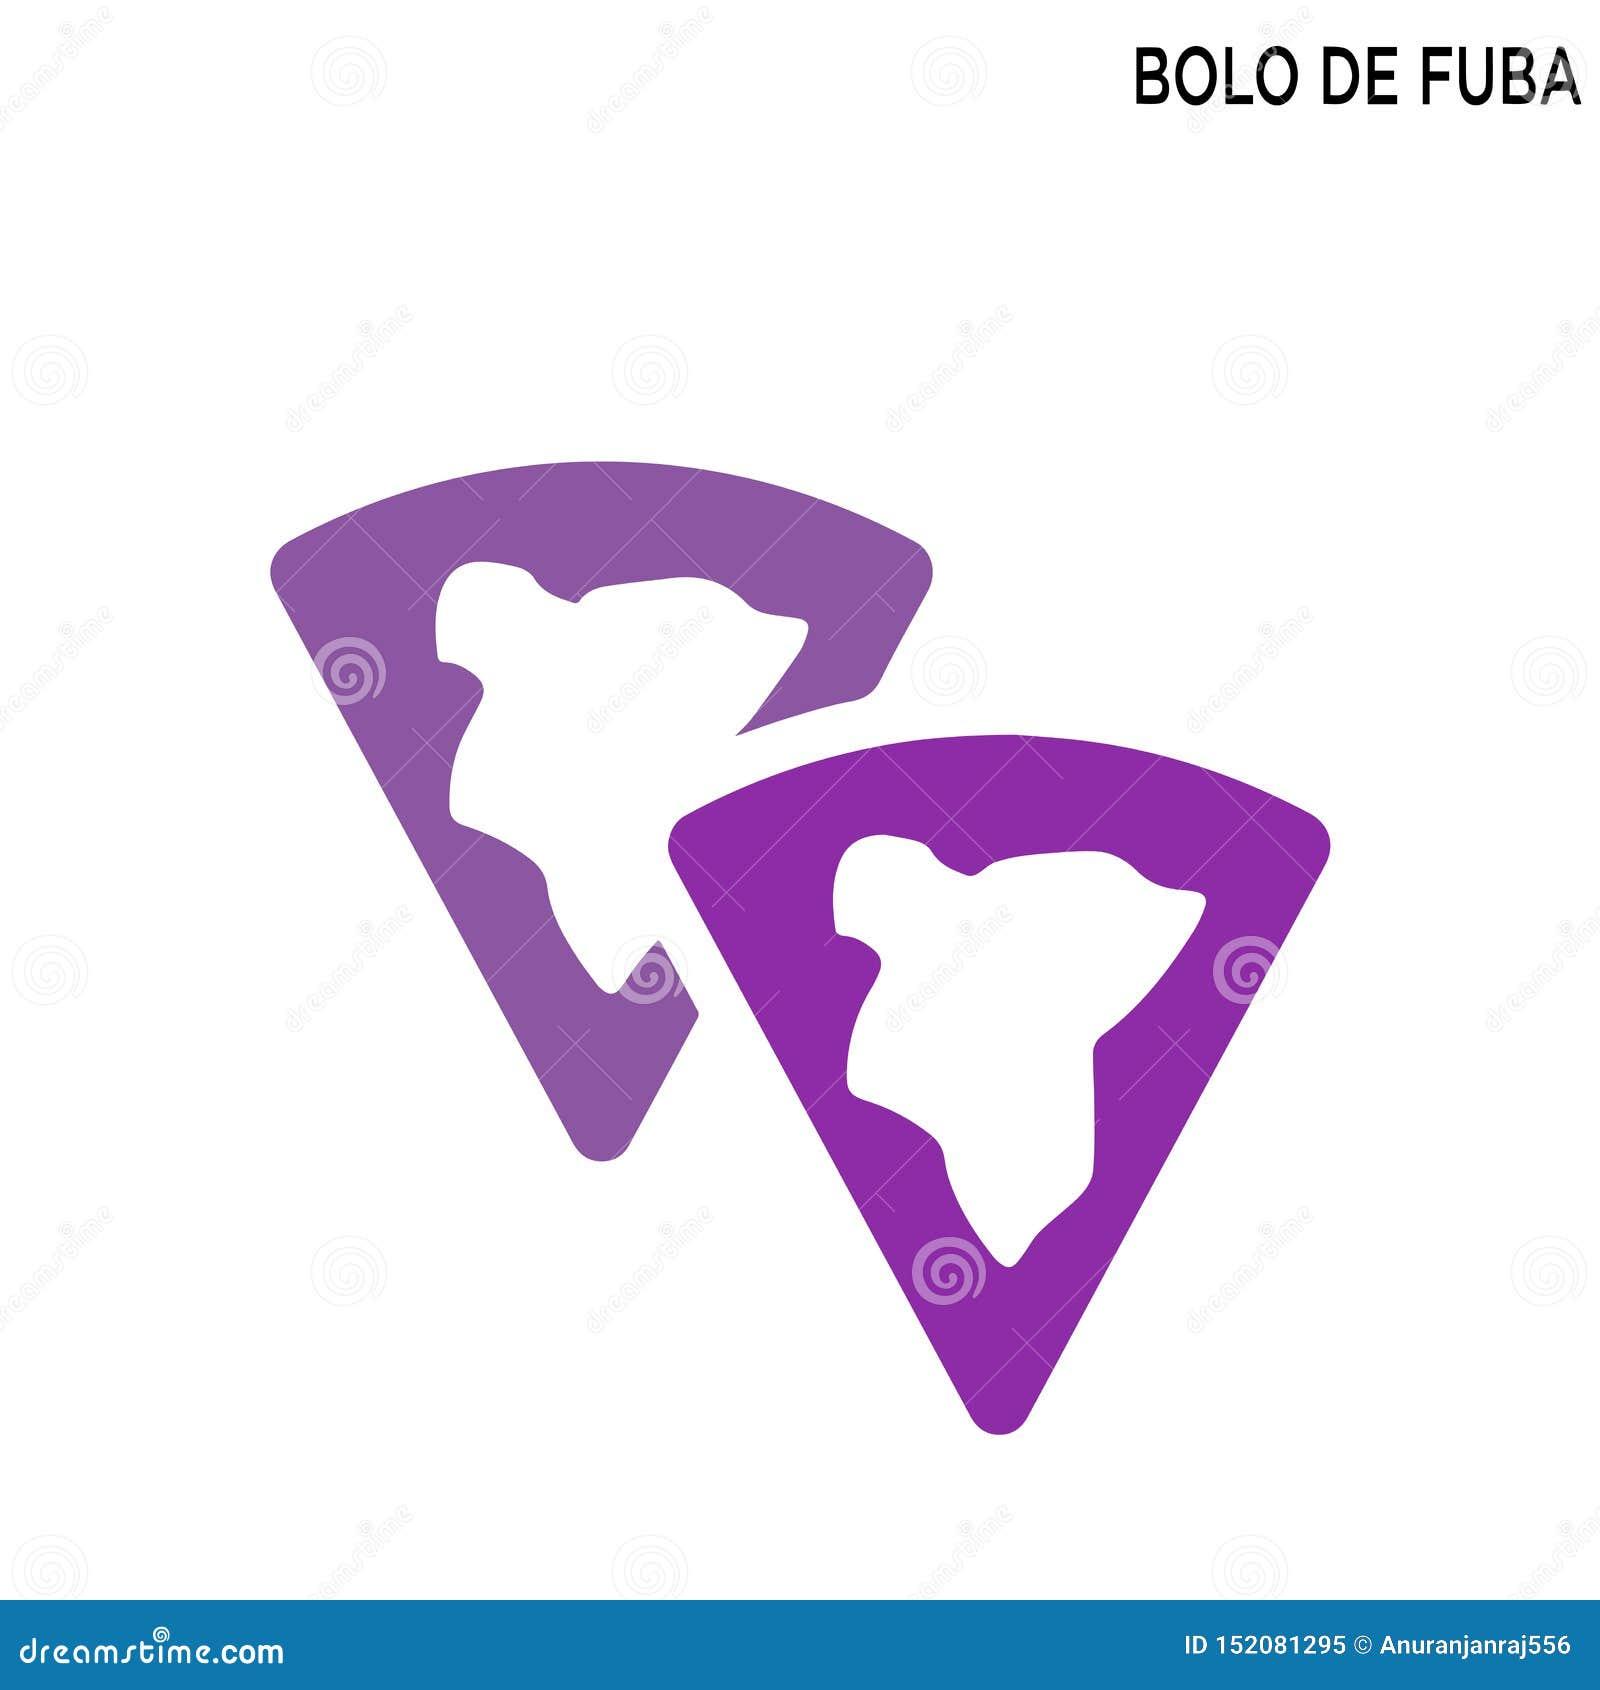 Bolo DE fuba editable pictogram